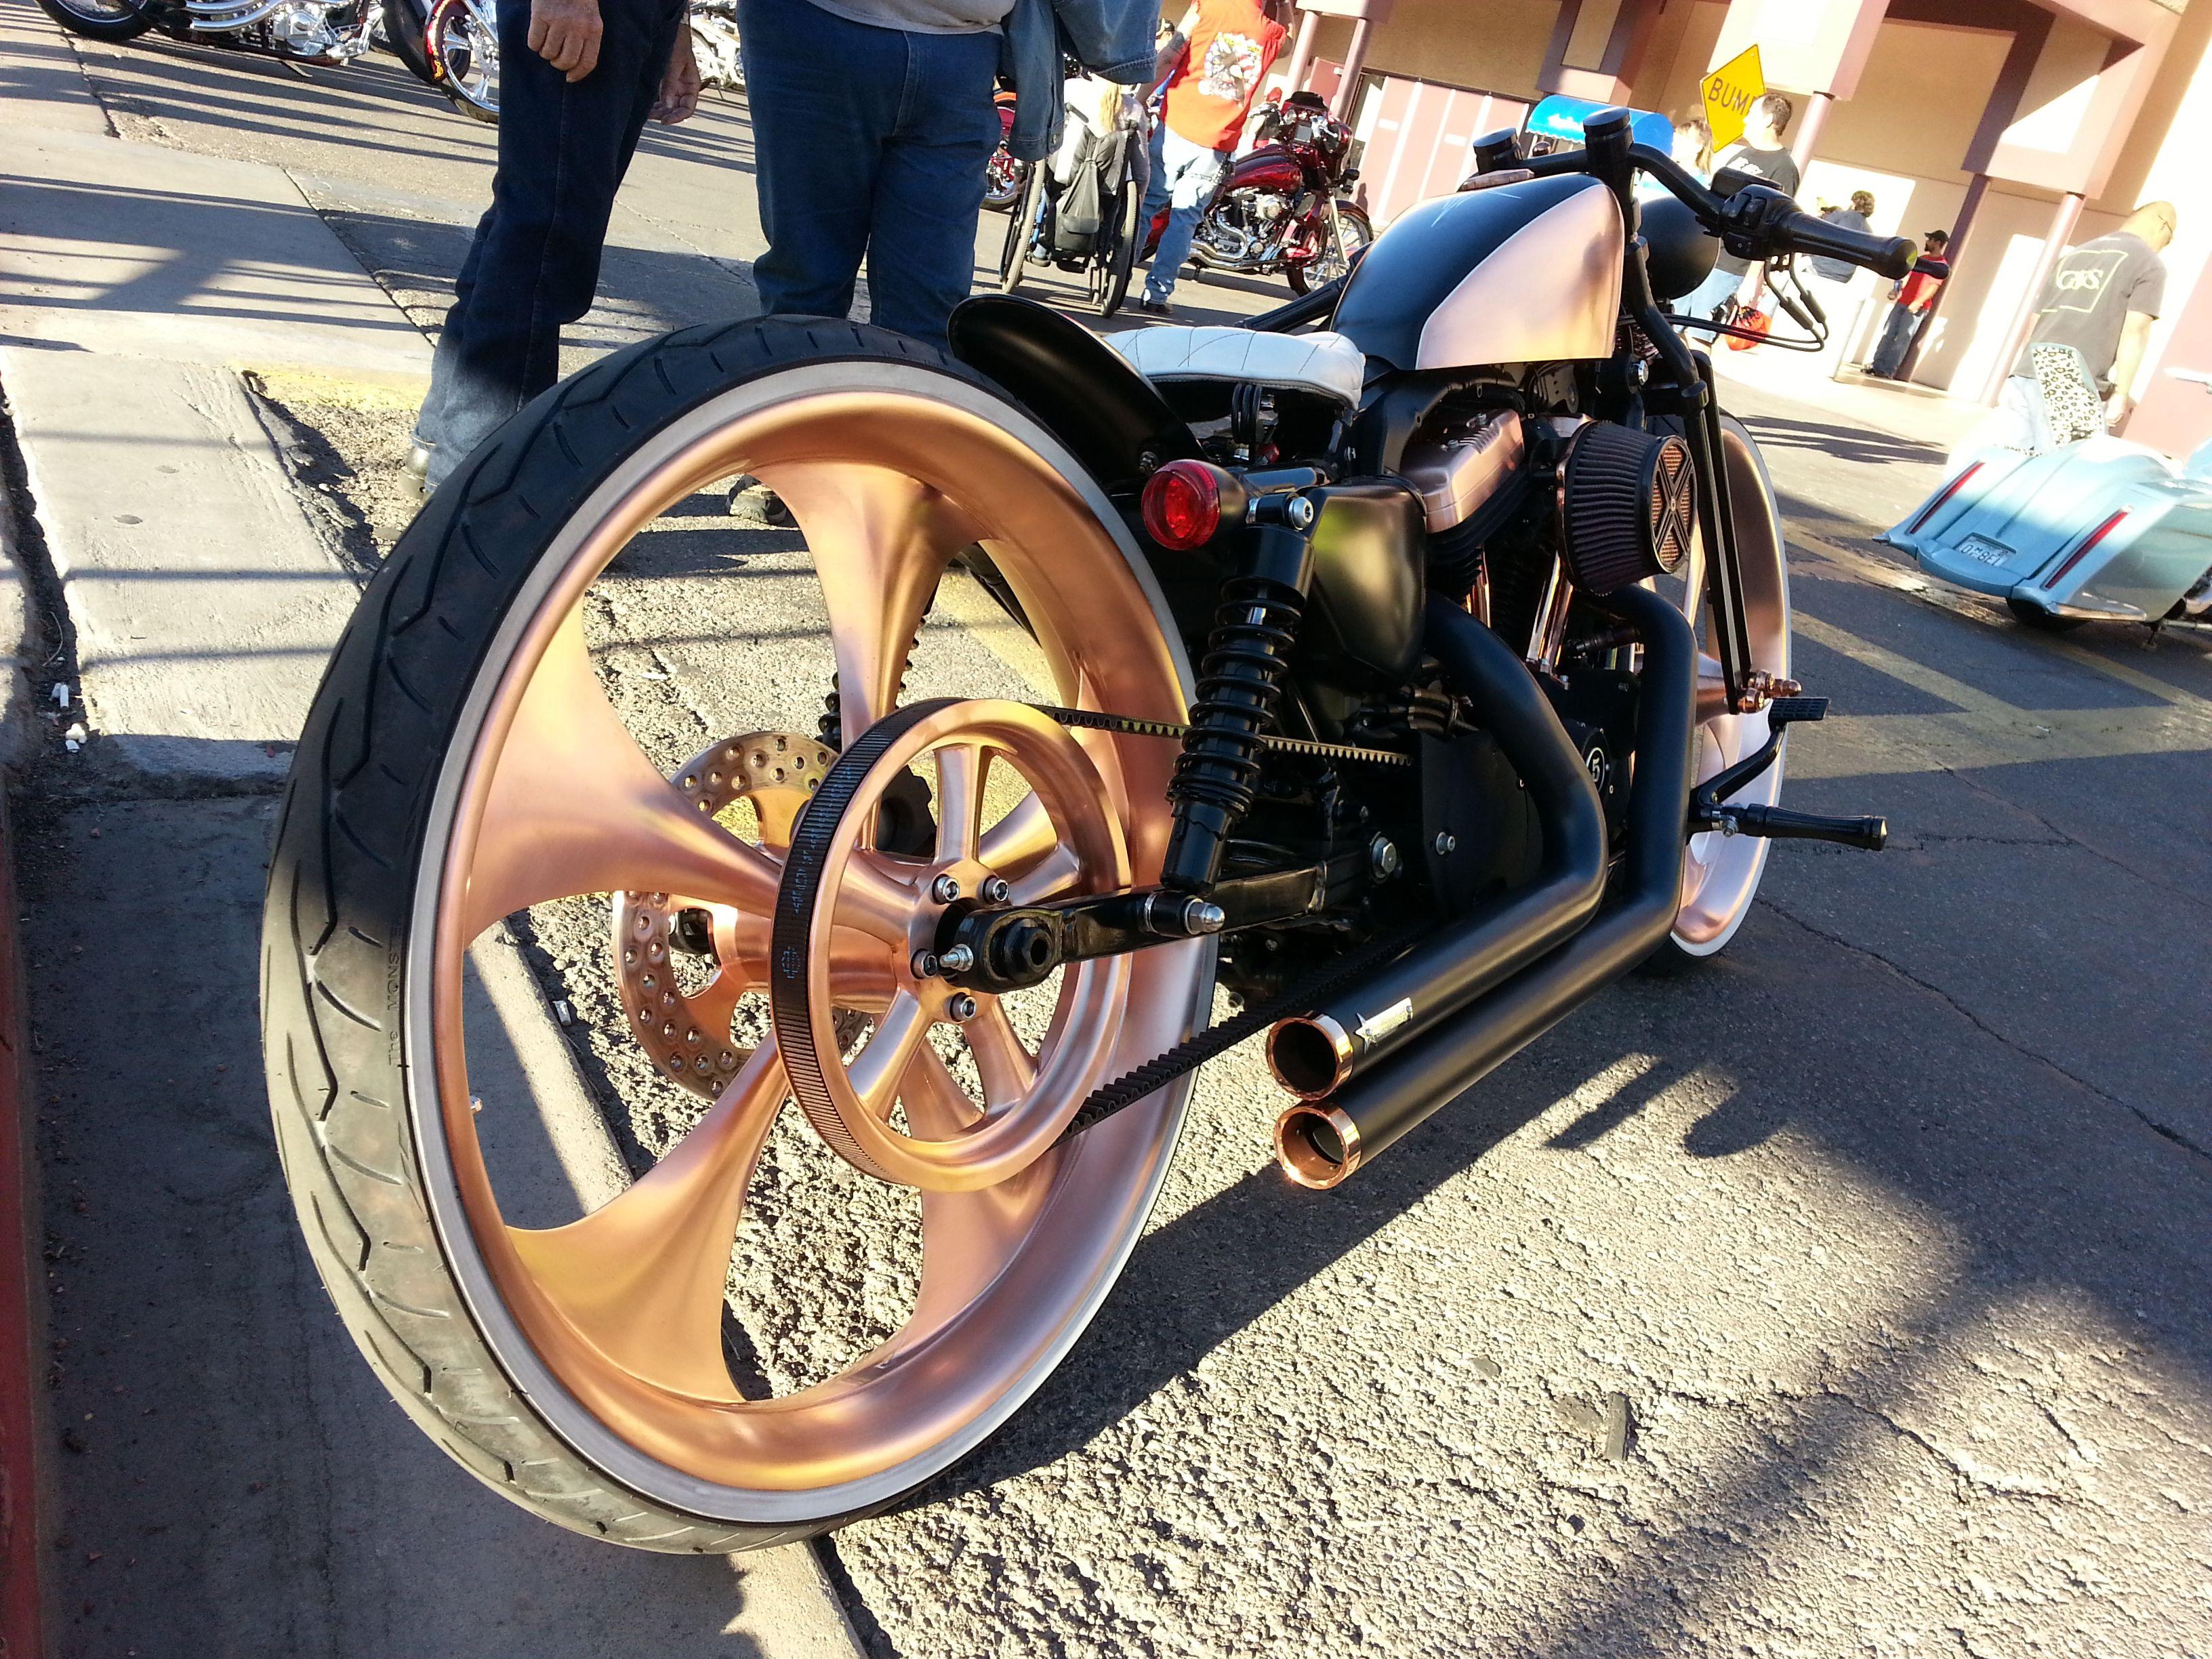 Russ Brown Motorcycle Lawyer at the Las Vegas BikeFest ...